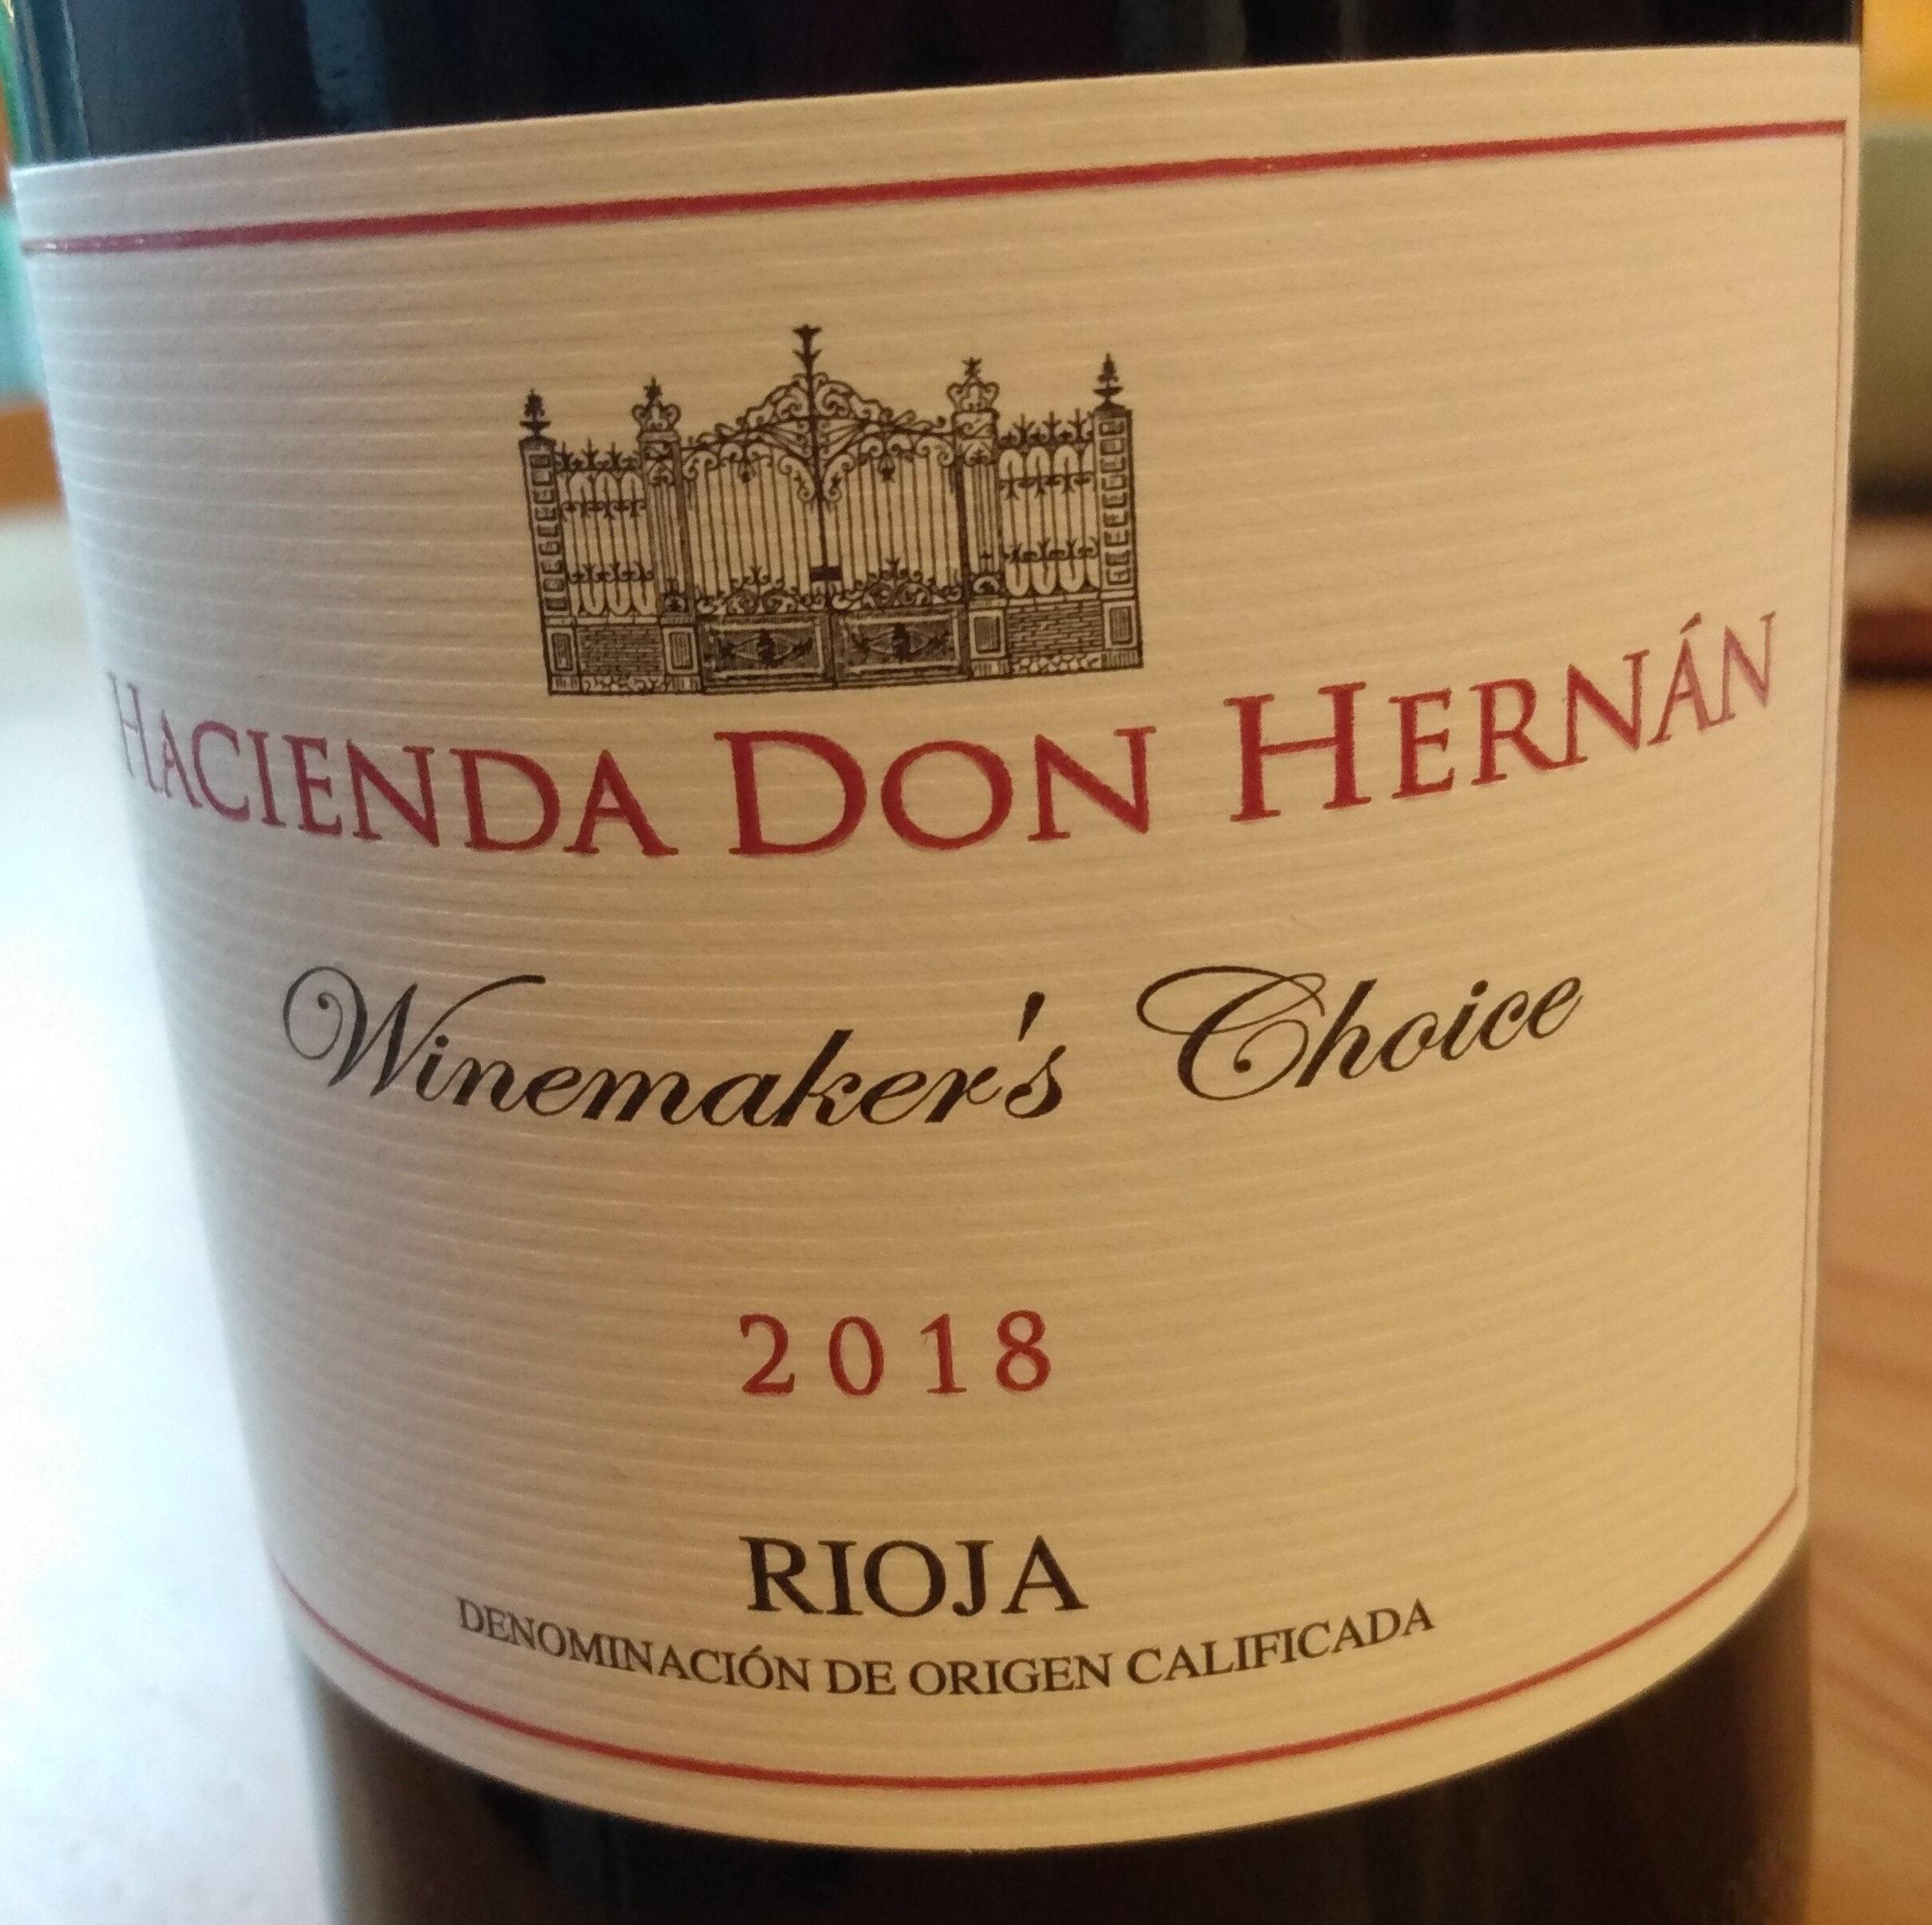 Rioja - Product - en